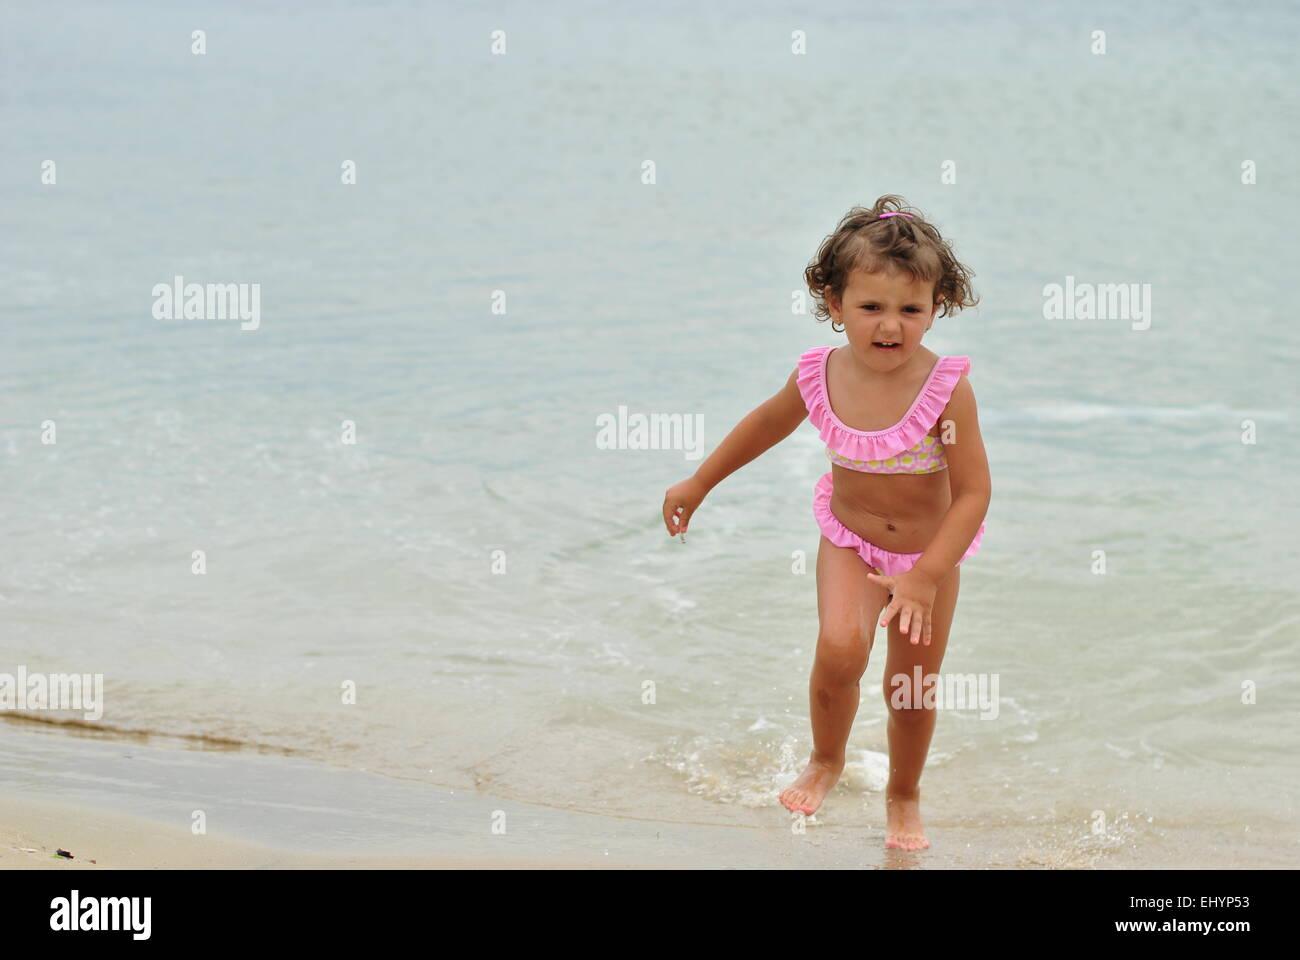 Girl in pink bikini court de mer Photo Stock